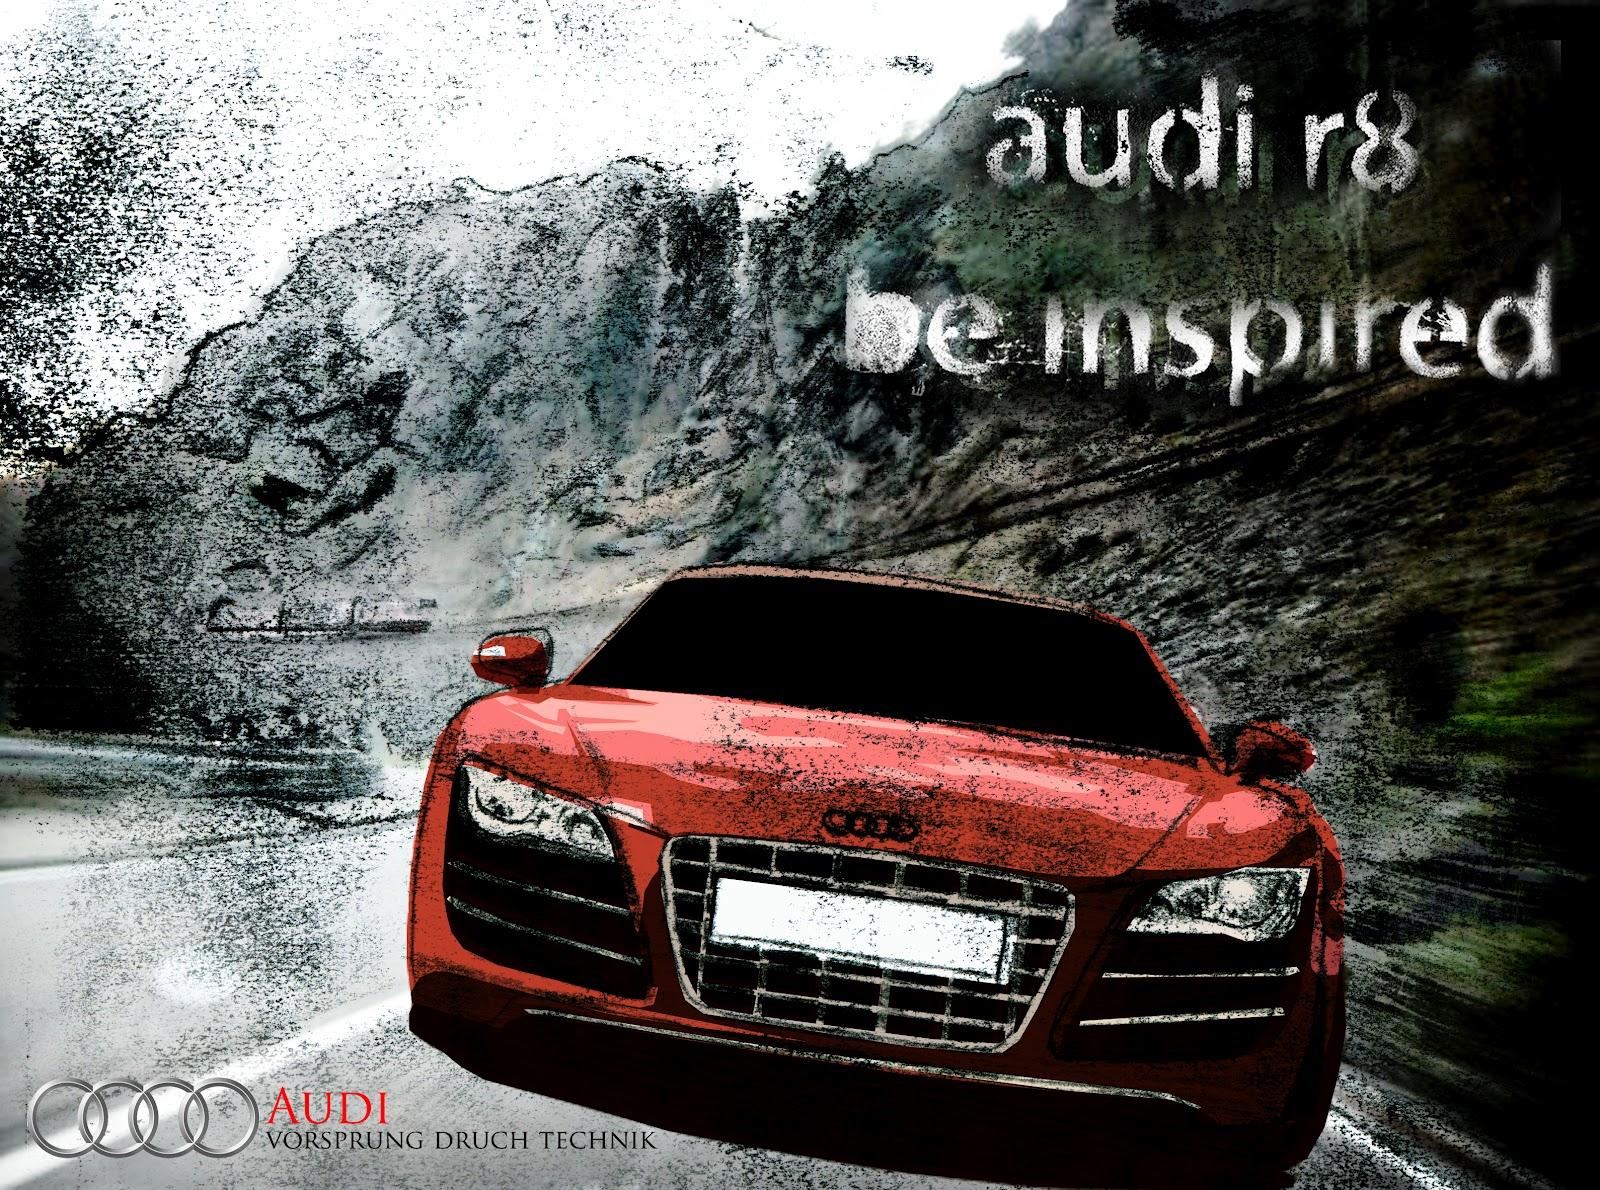 Matt Drewry: Audi R8